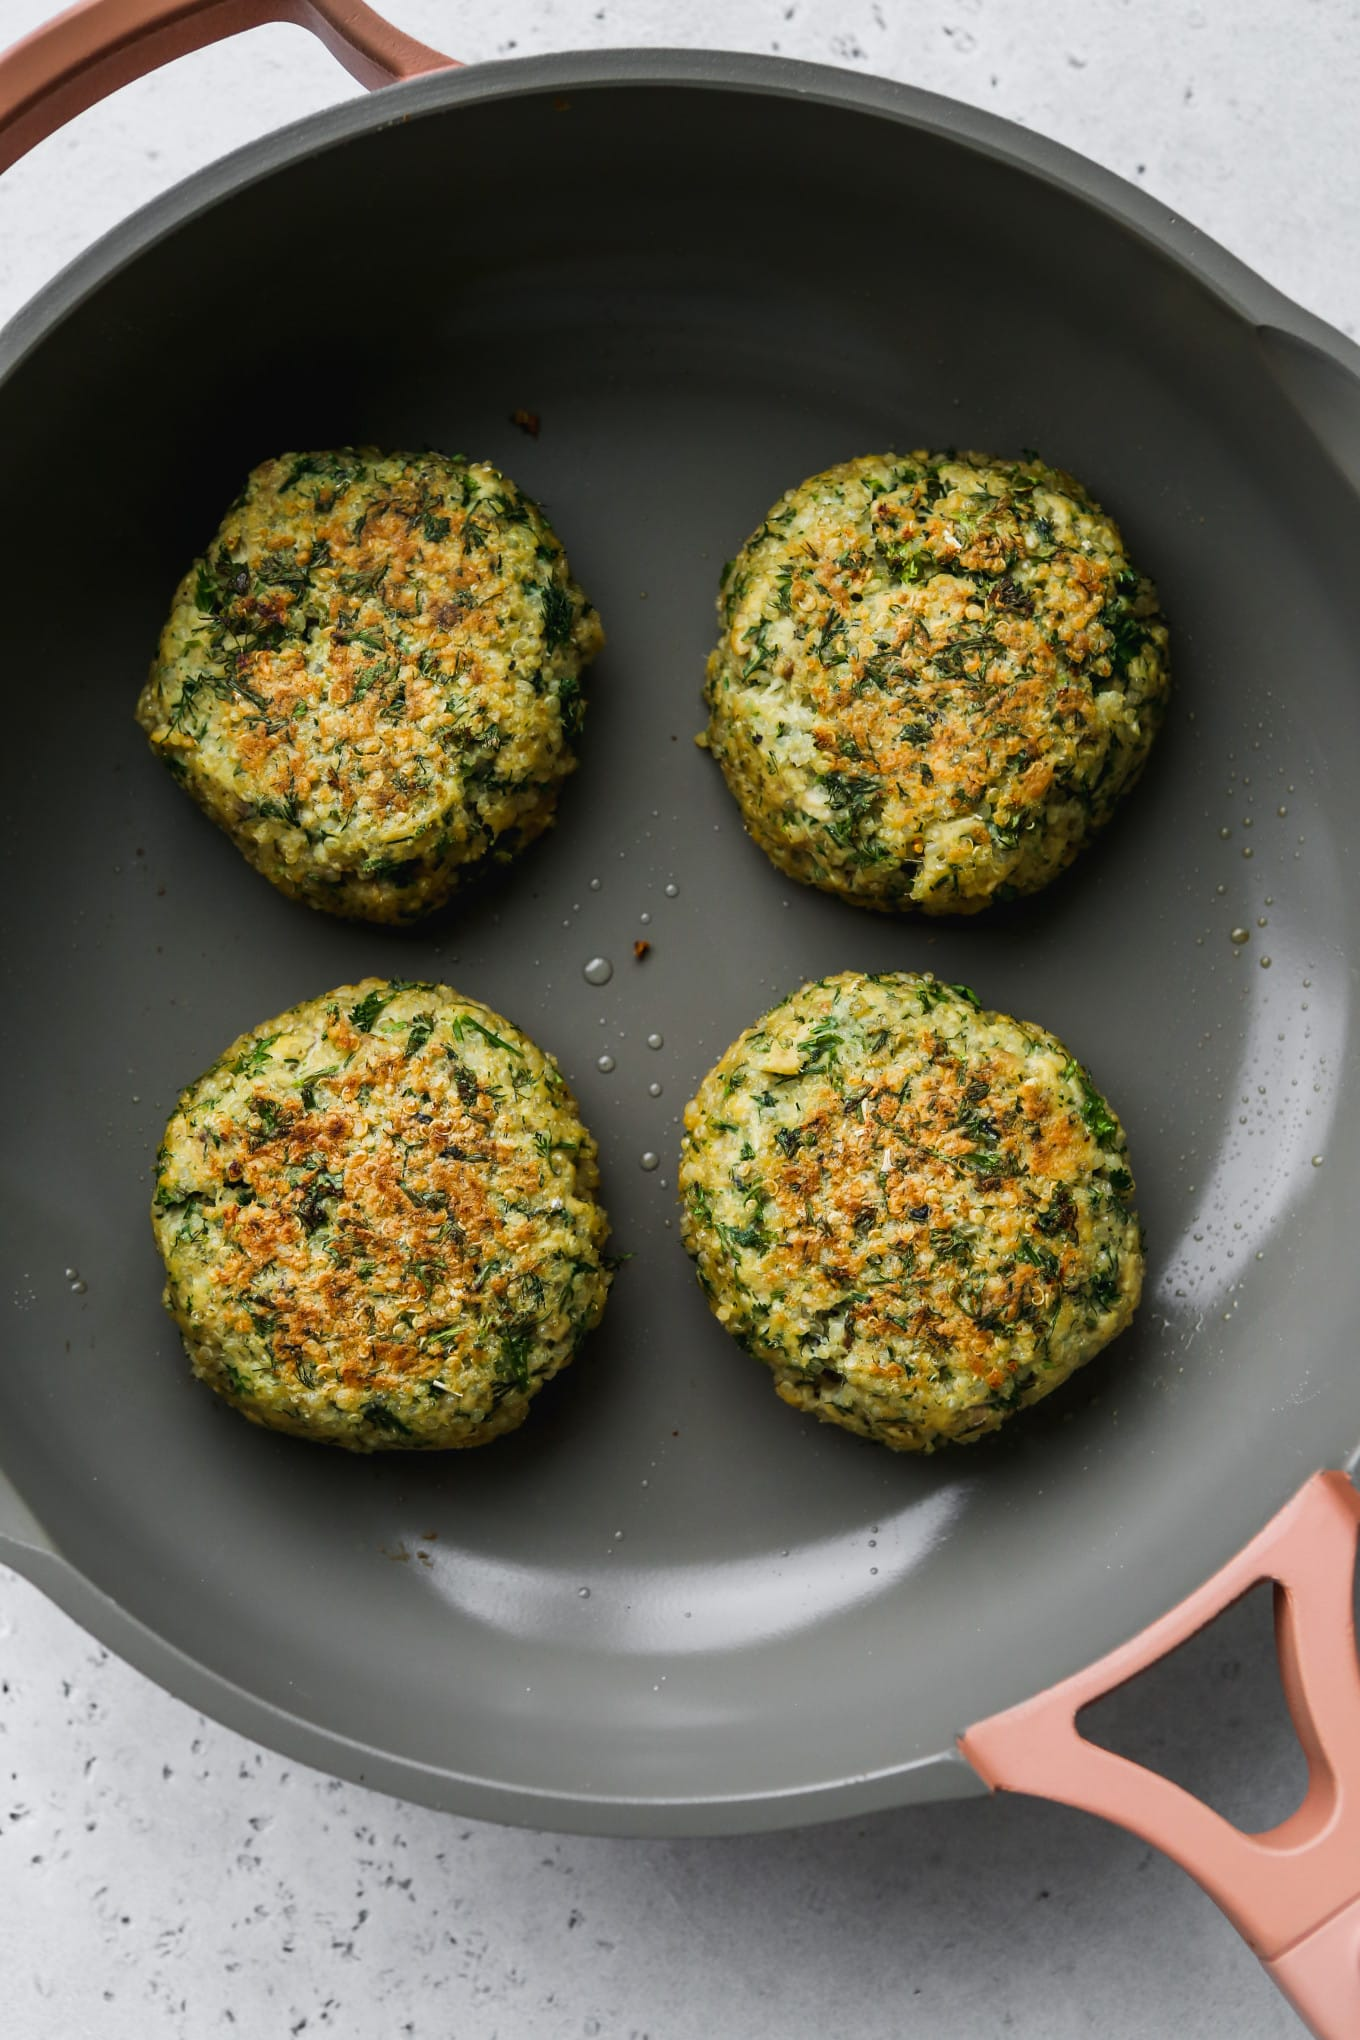 Overhead photo of 4 cooked salmon quinoa burger patties on a pan.